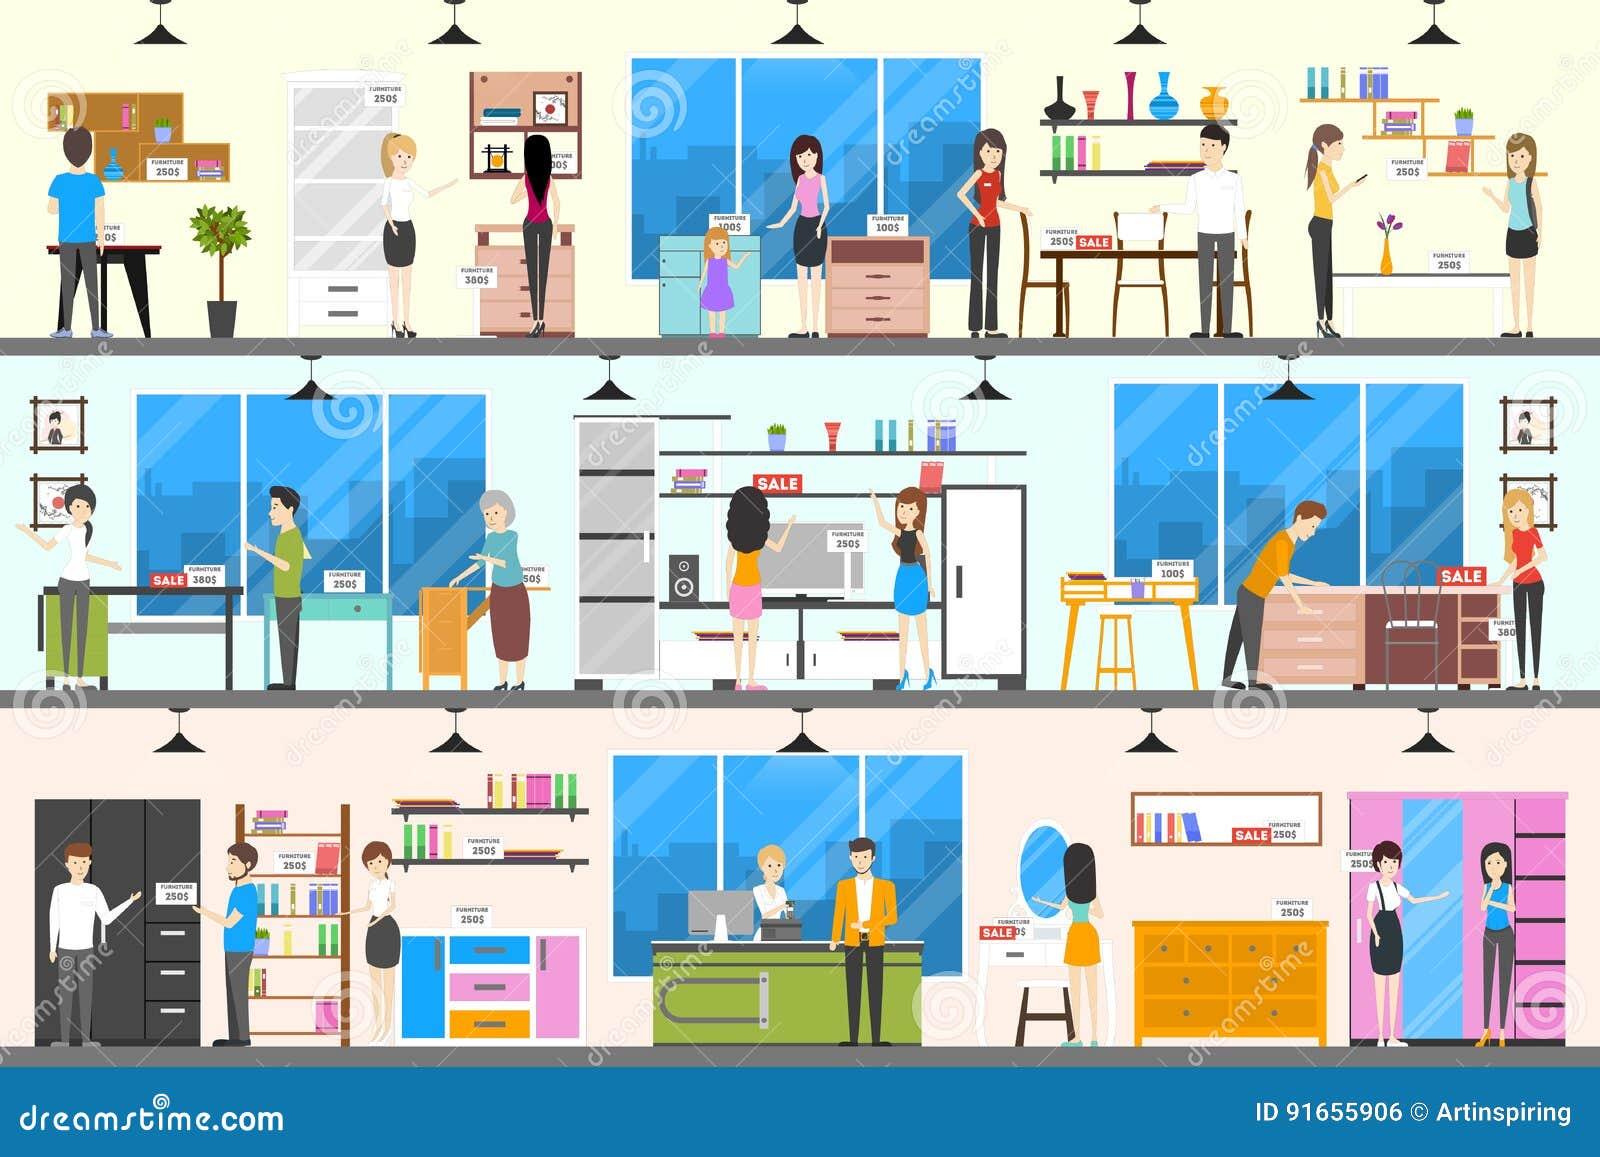 furniture store interior stock vector illustration of people 91655906. Black Bedroom Furniture Sets. Home Design Ideas